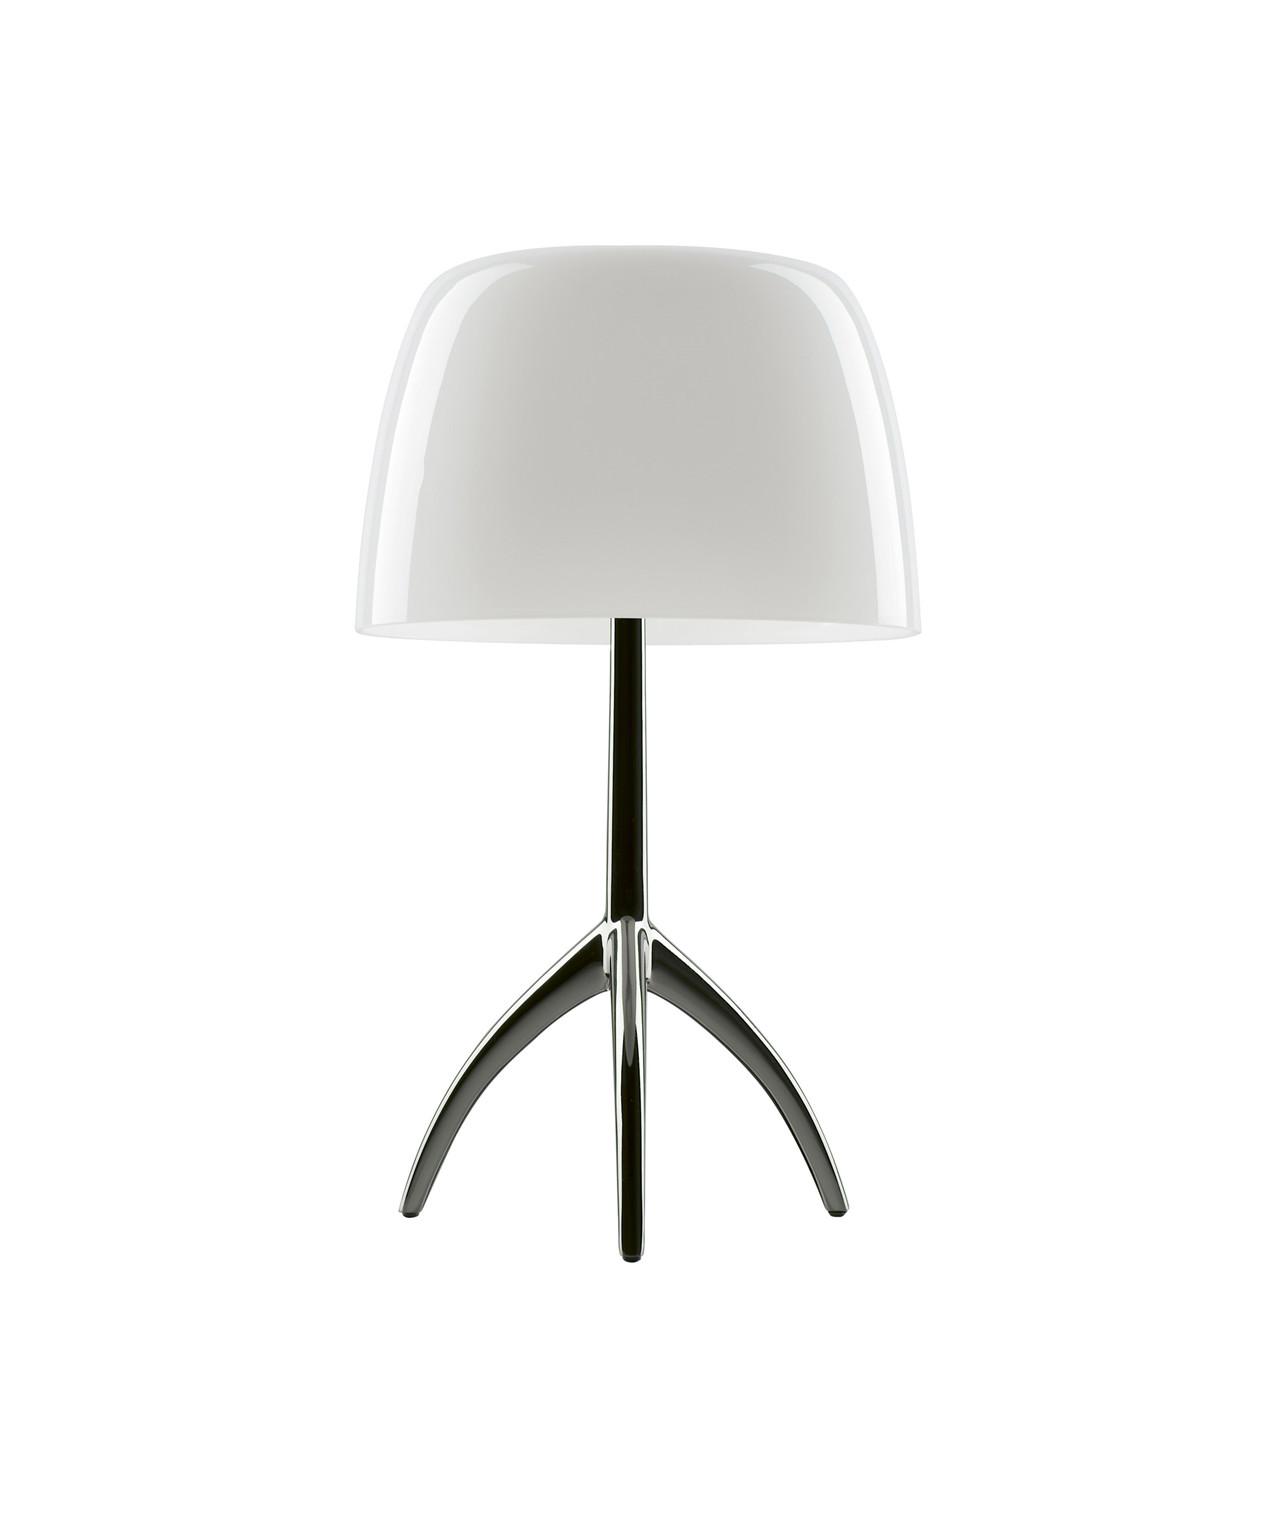 Lumiere Grande Bordlampe m/Dimmer Sort Krom/Hvid - Foscarini